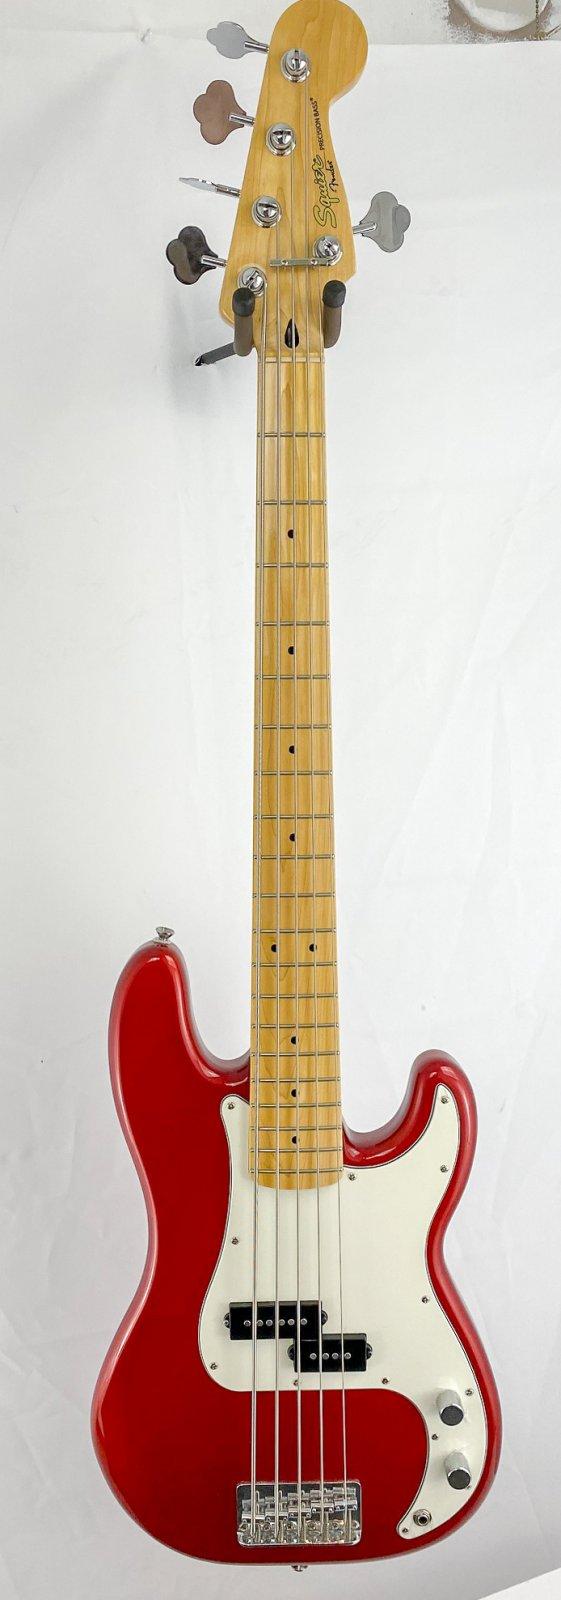 Squier 5-string Precision Bass w/gigbag